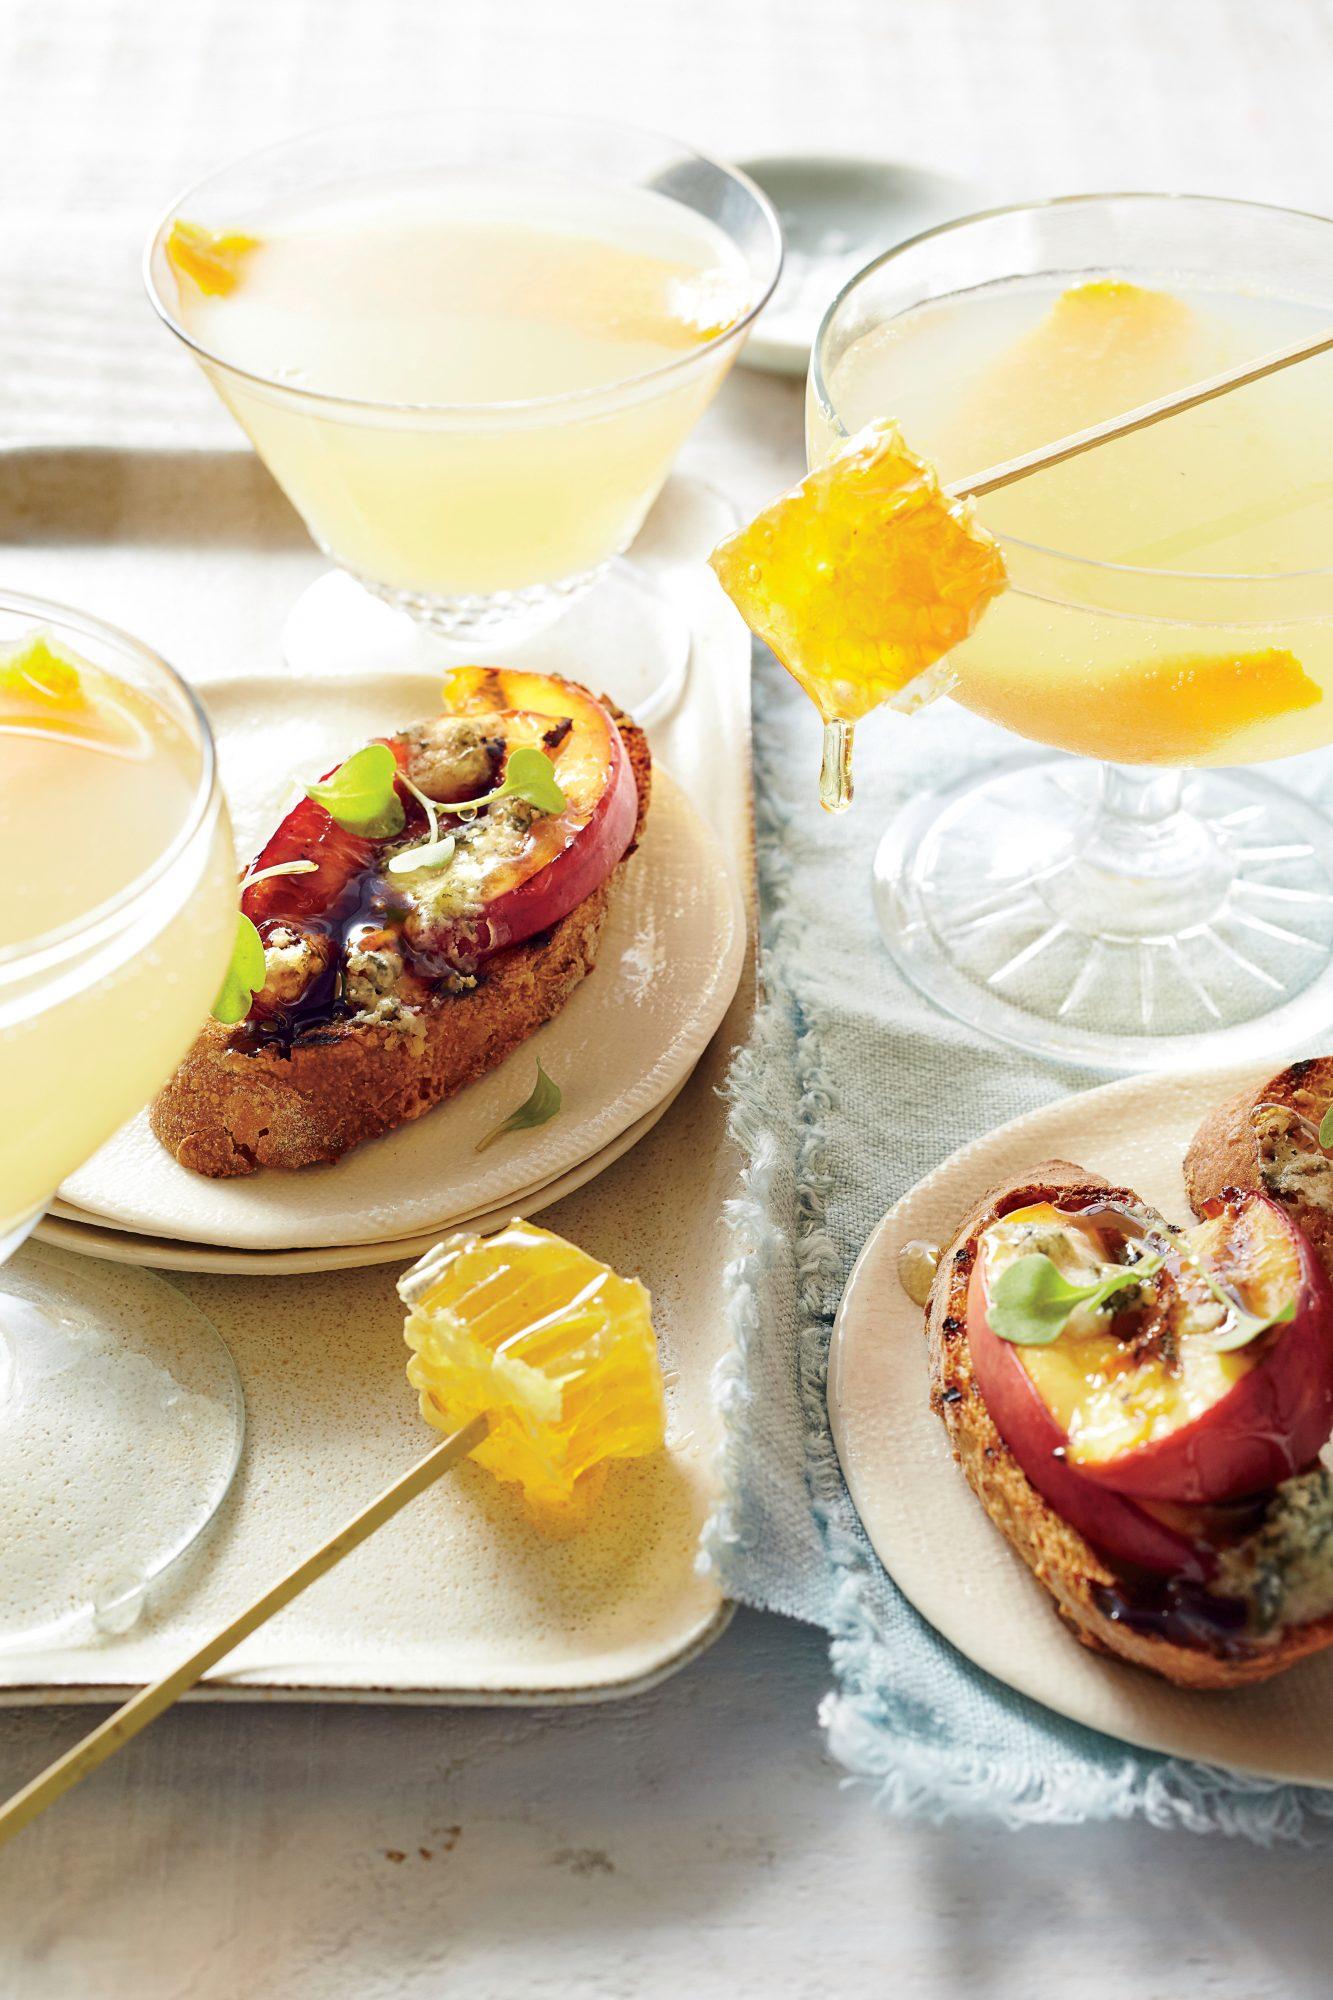 Grilled Nectarine and Blue Cheese Bruschetta